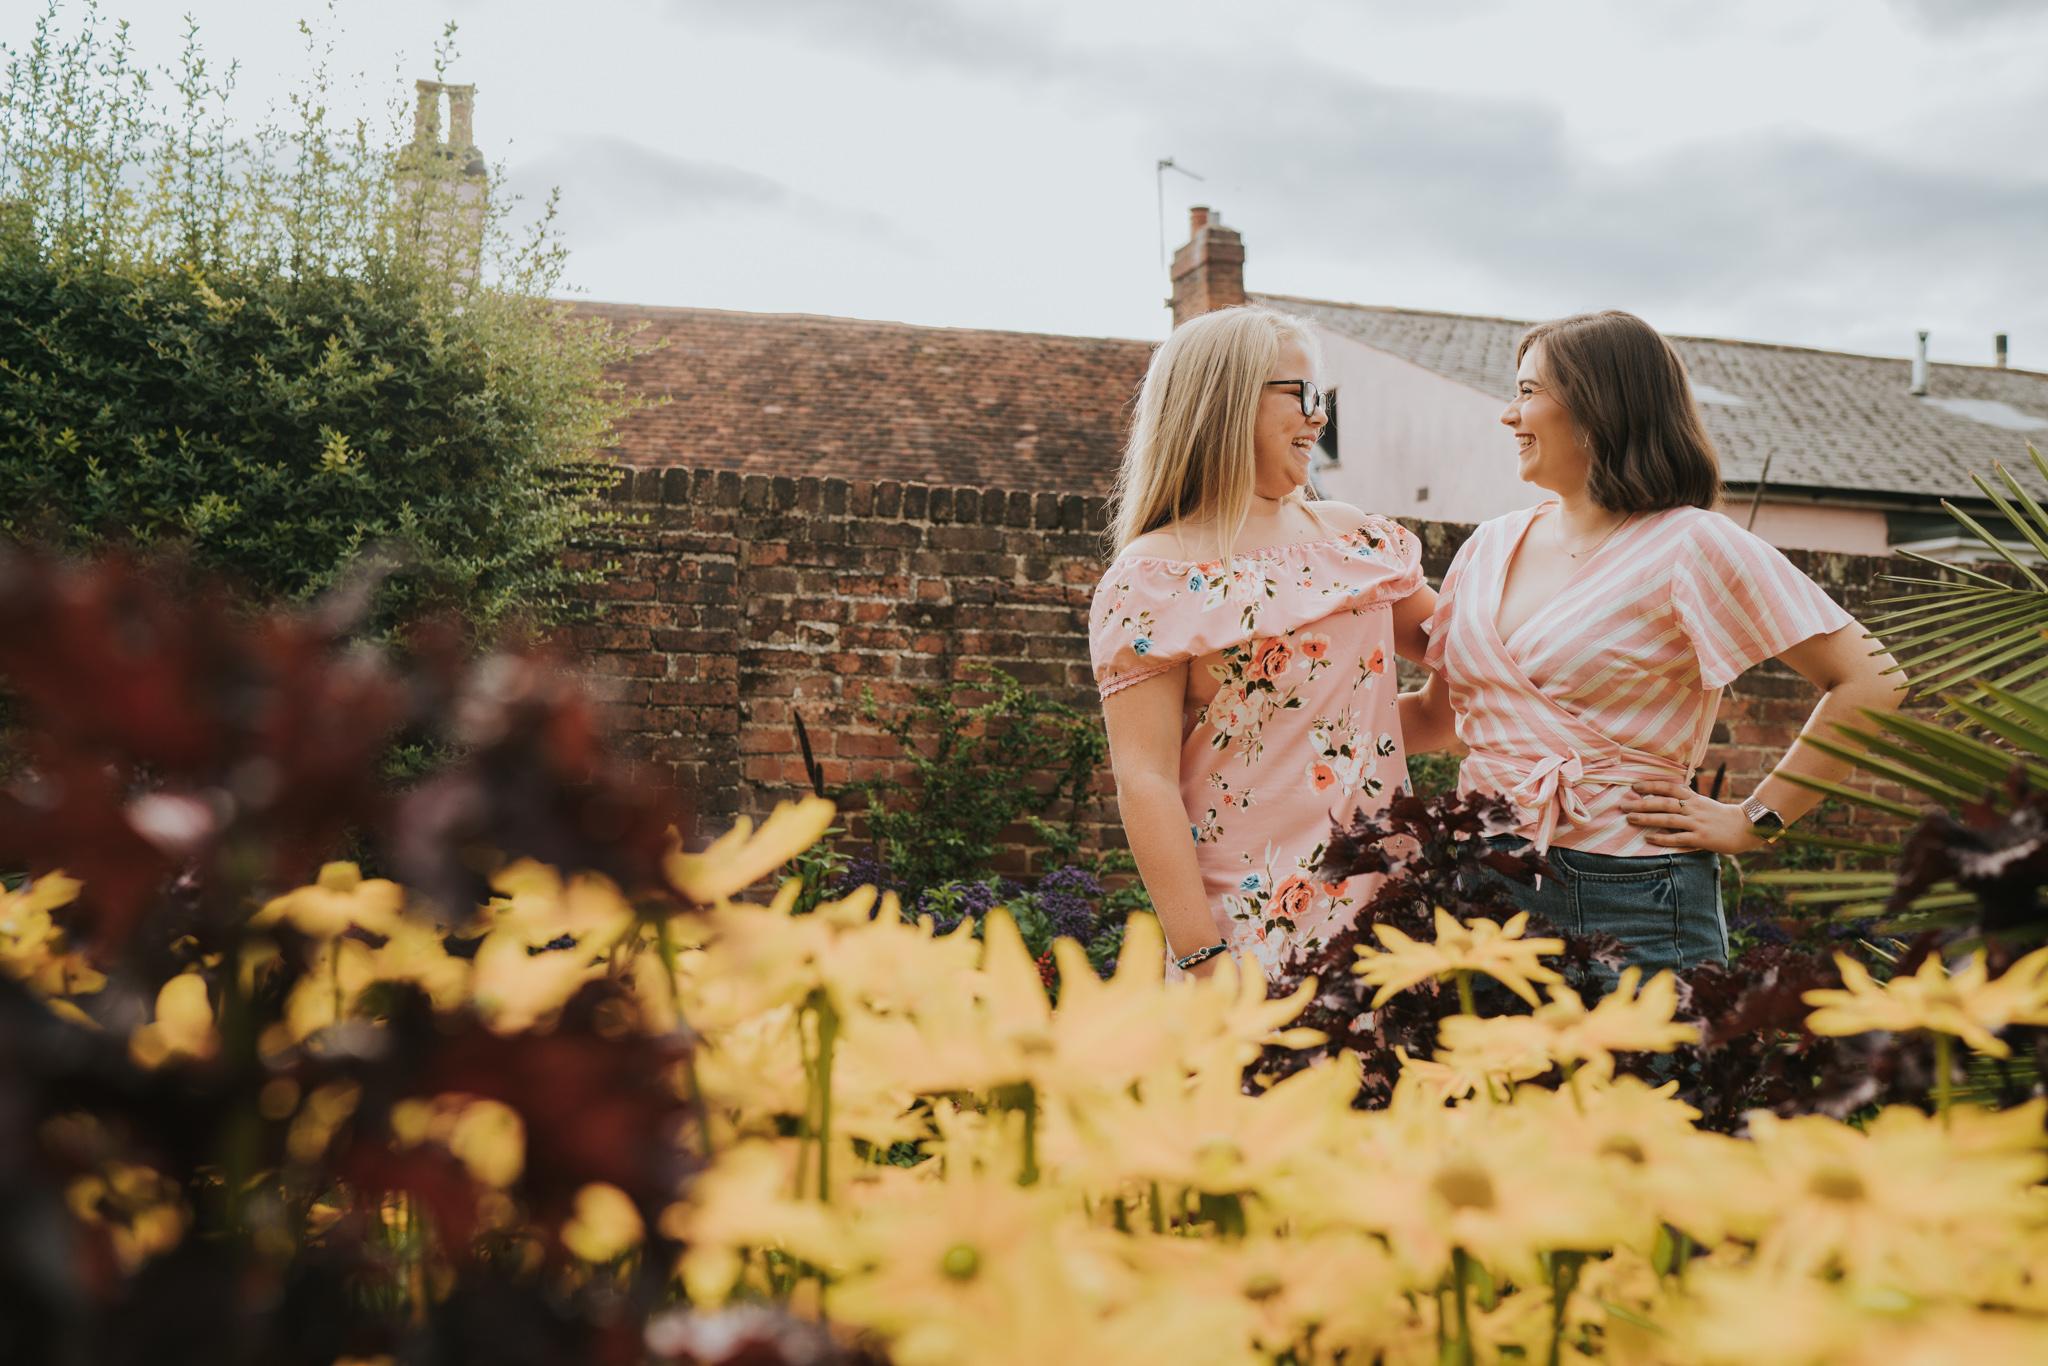 Fitch-Family-Colchester-Castle-Park-Grace-Elizabeth-Alternative-Wedding-Lifestyle-Photographer-Colchester-Essex-Suffolk-Norfolk-Devon (3 of 41).jpg